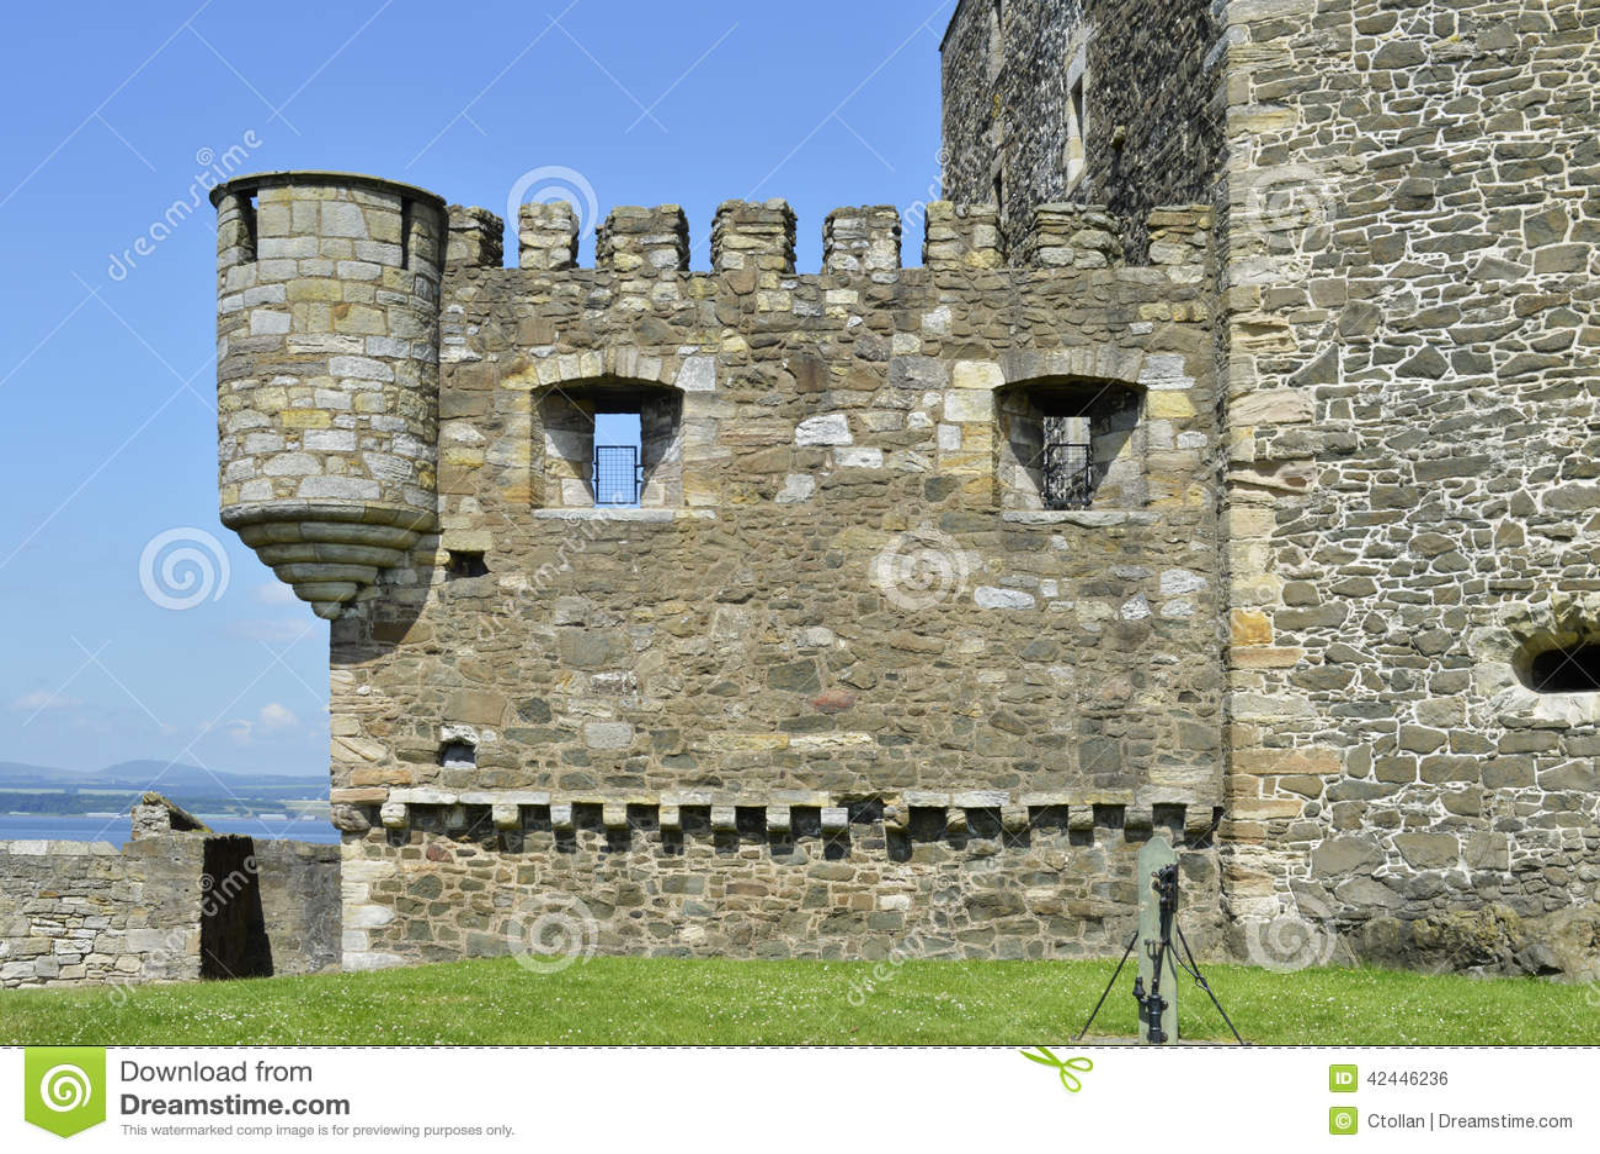 Castillo de la negrura